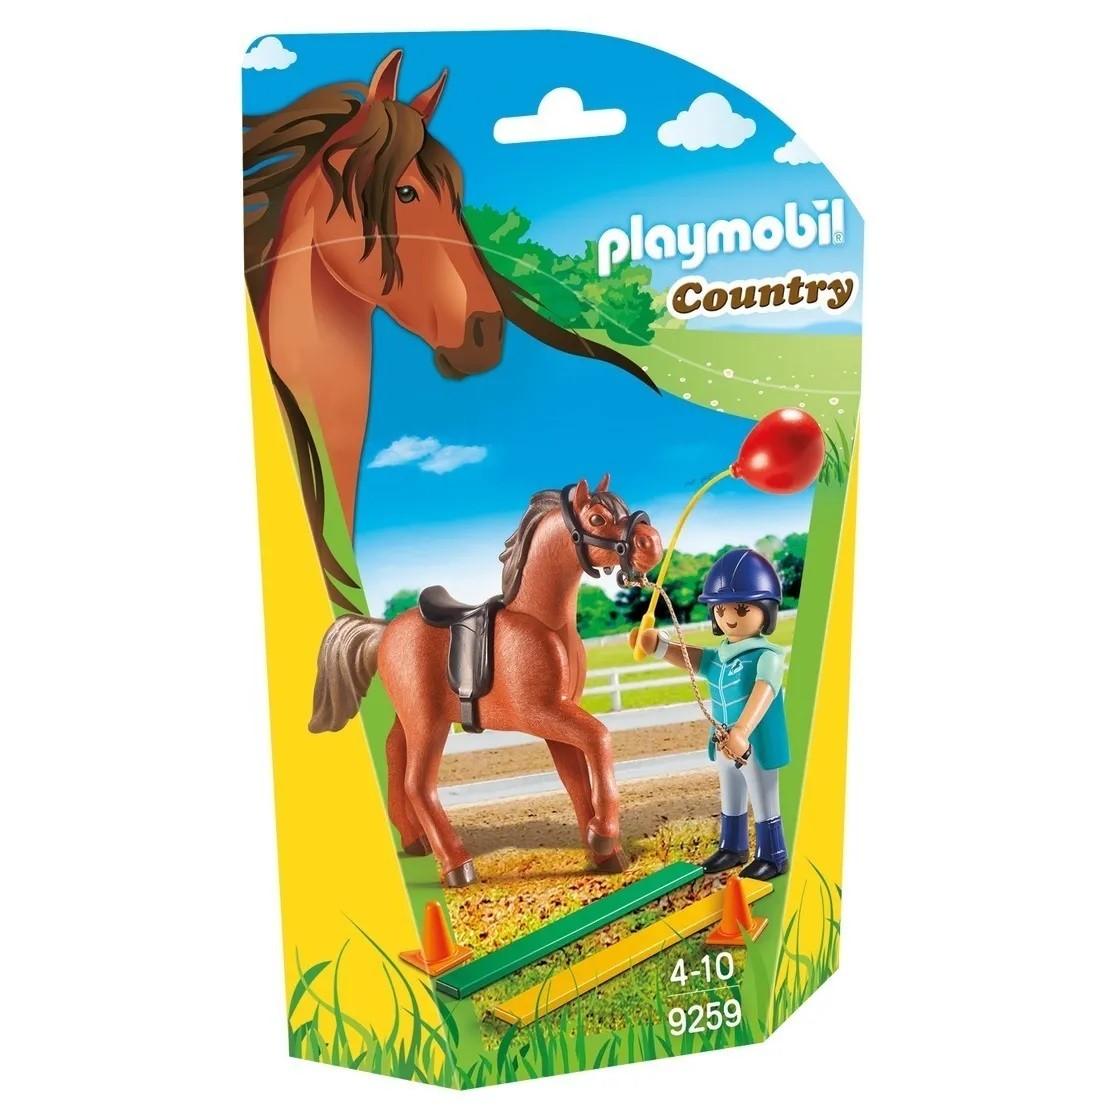 Playmobil Soft Bags Country Cavalo Marrom 9259 - Sunny